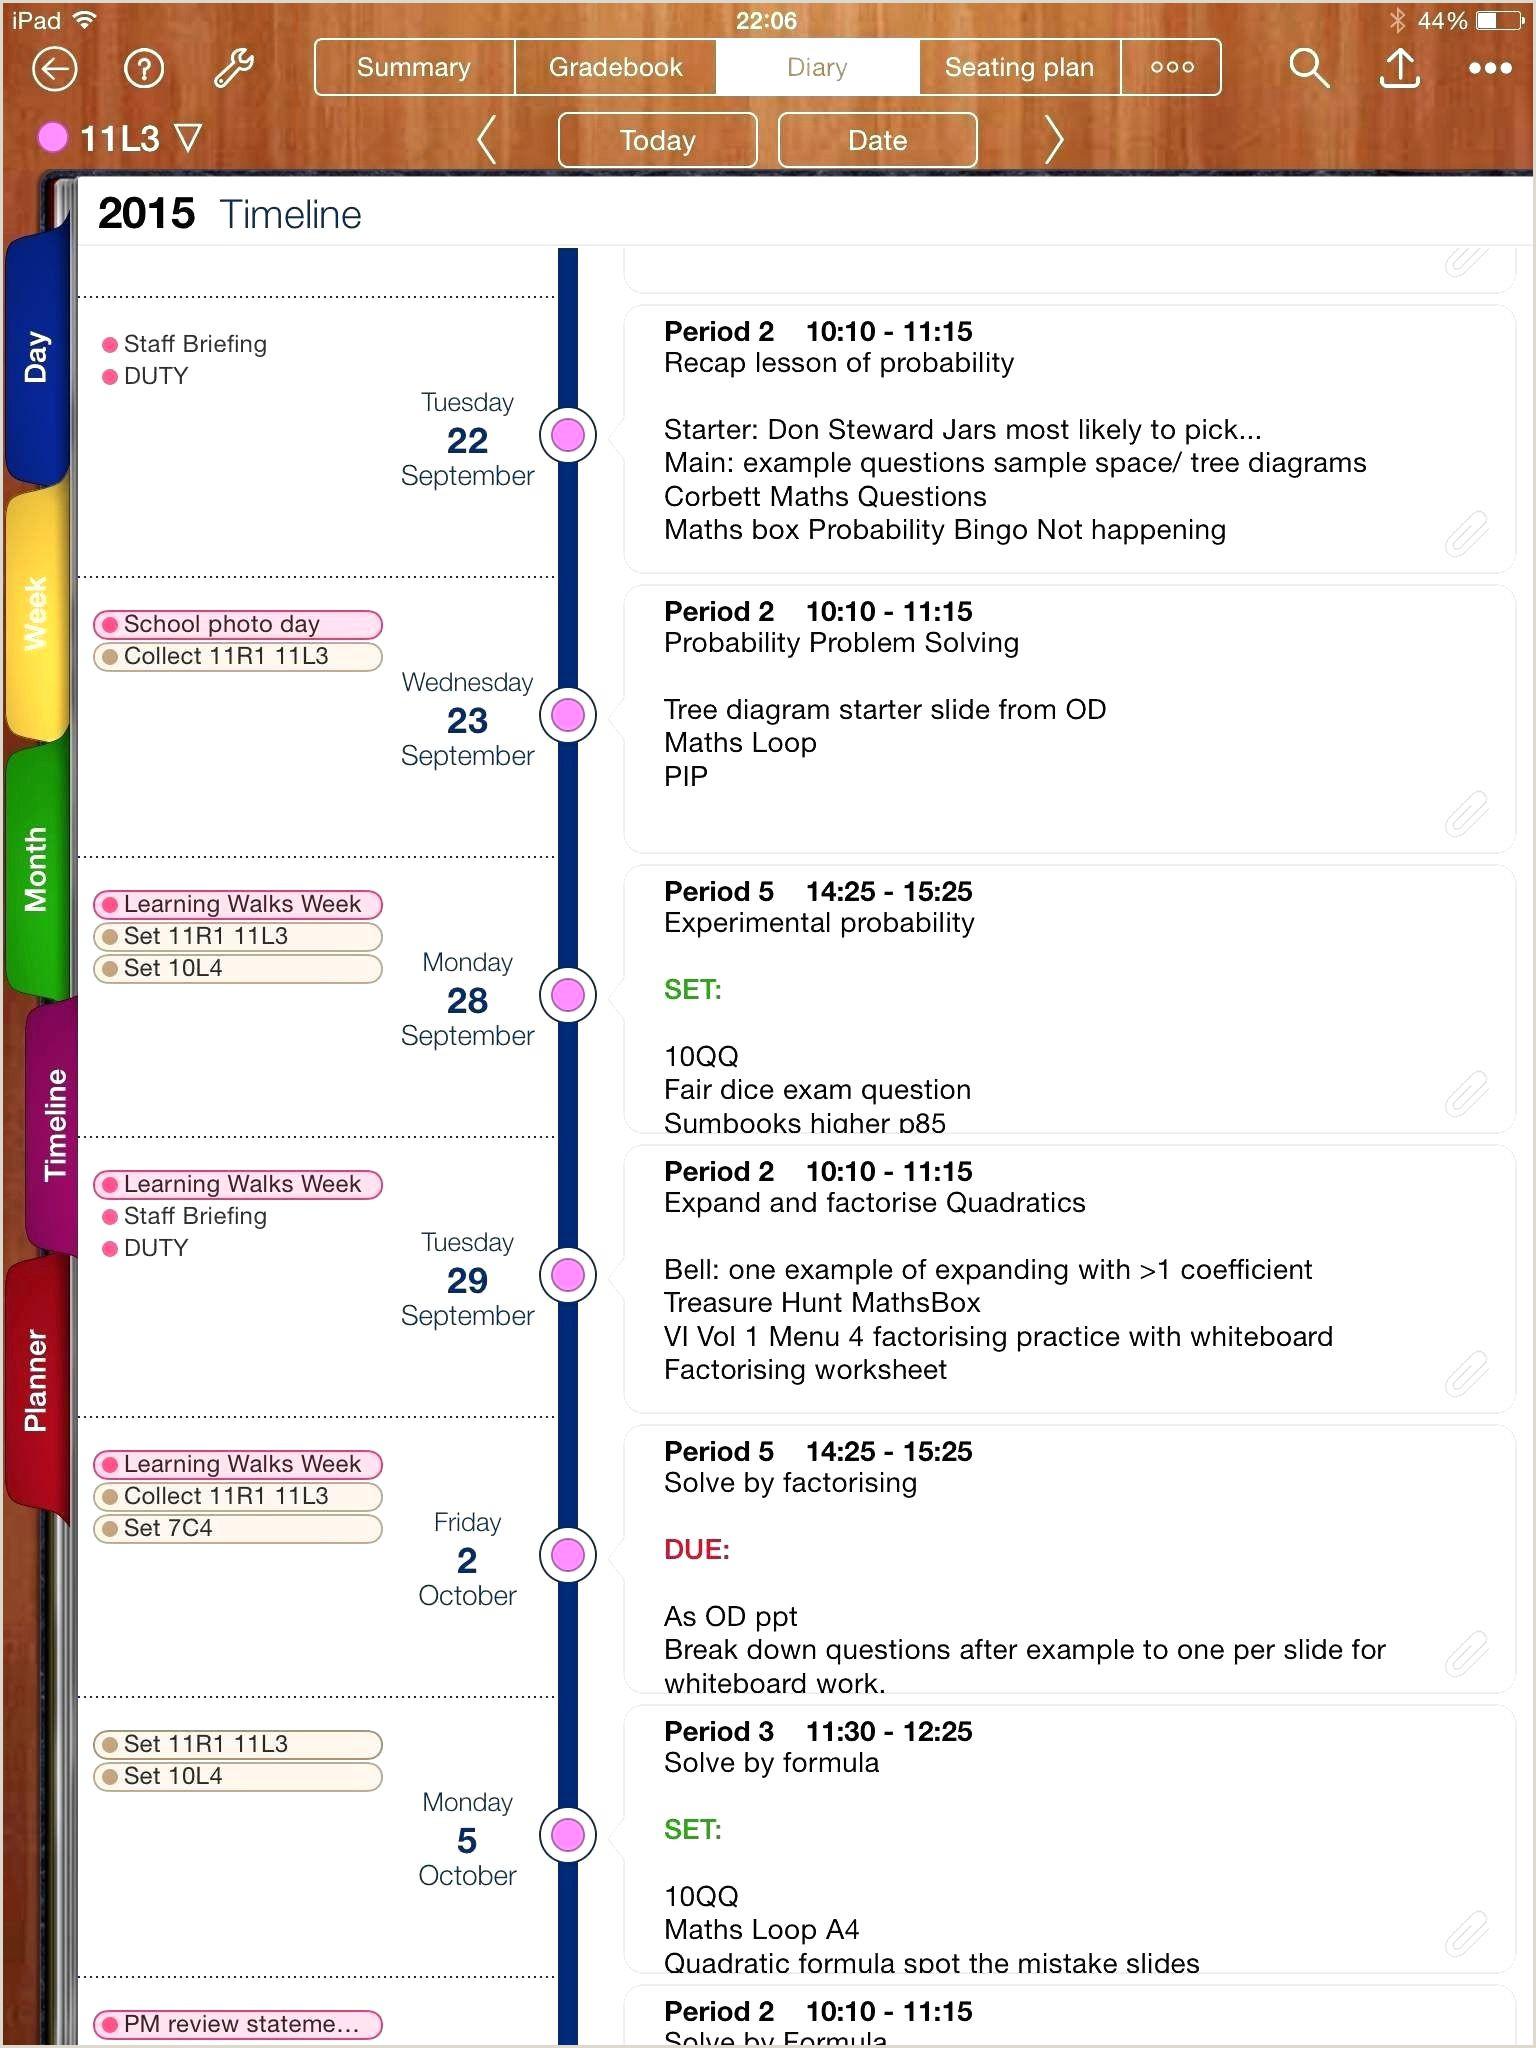 Lebenslauf Muster Pages 15 Lebenslauf Muster Kostenlos Word